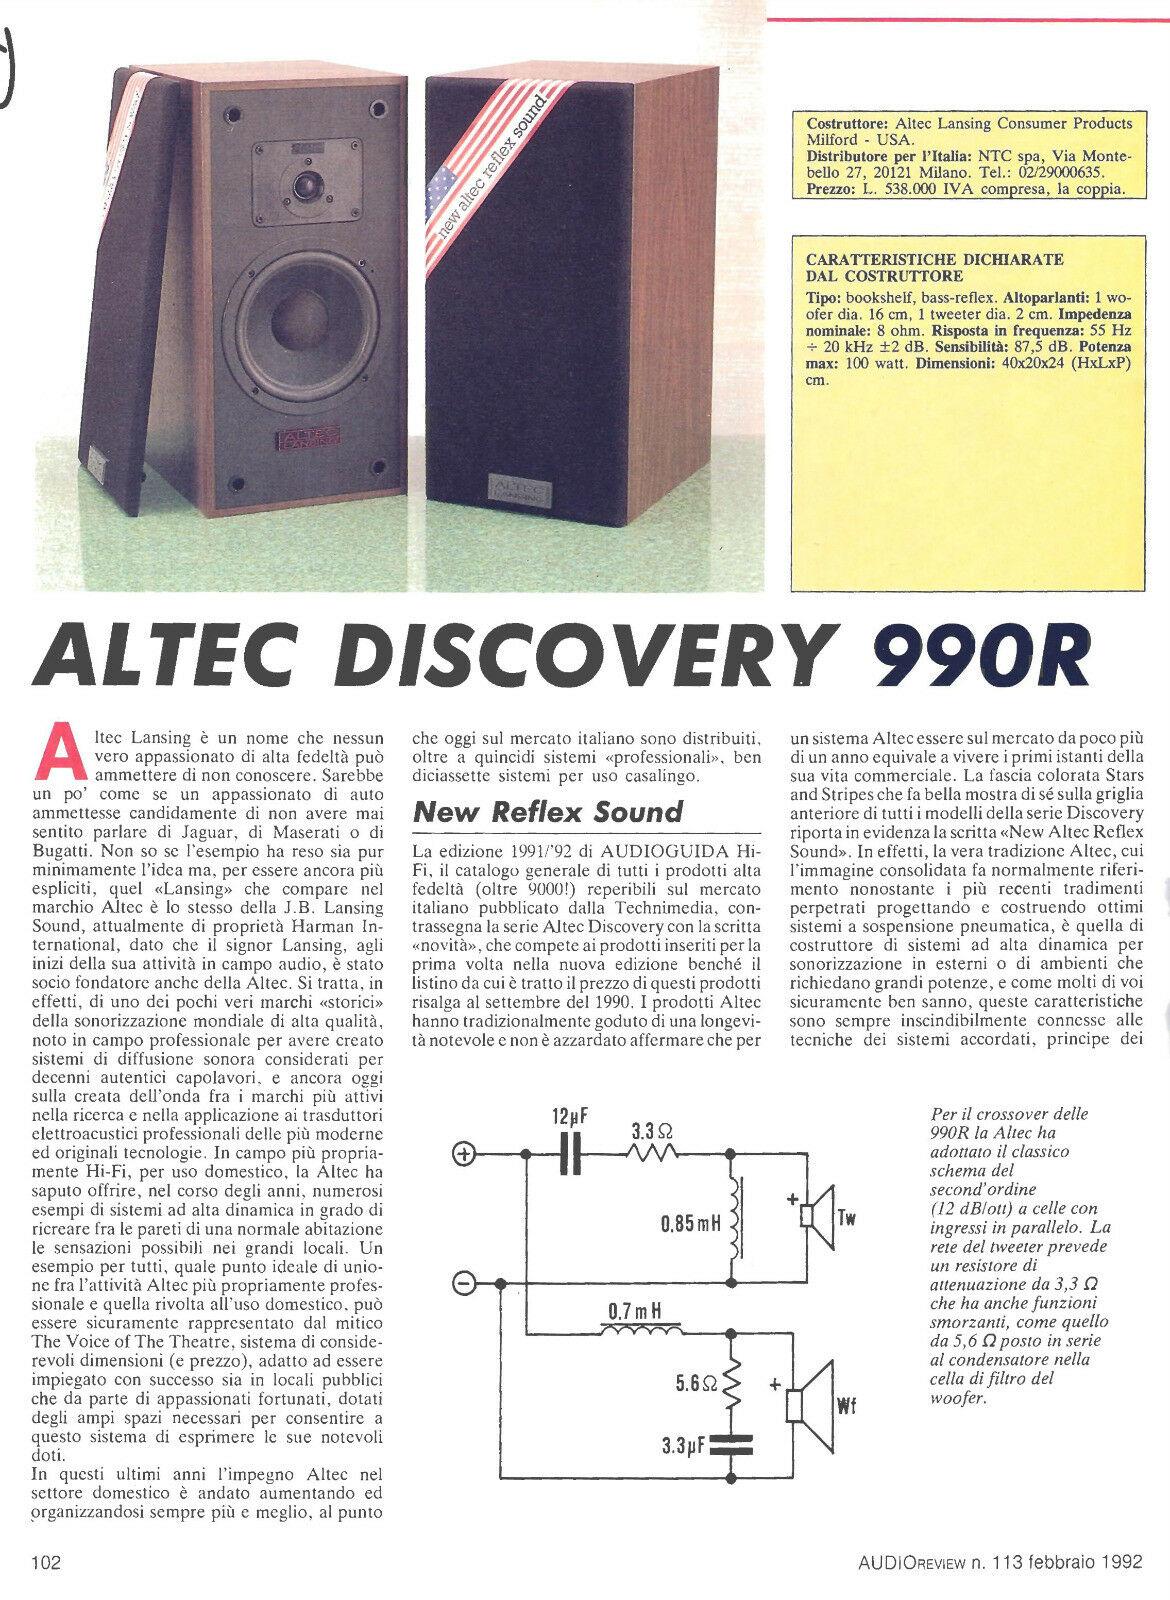 Acoustic Research AR12: restauro o... - Pagina 2 Diffus13